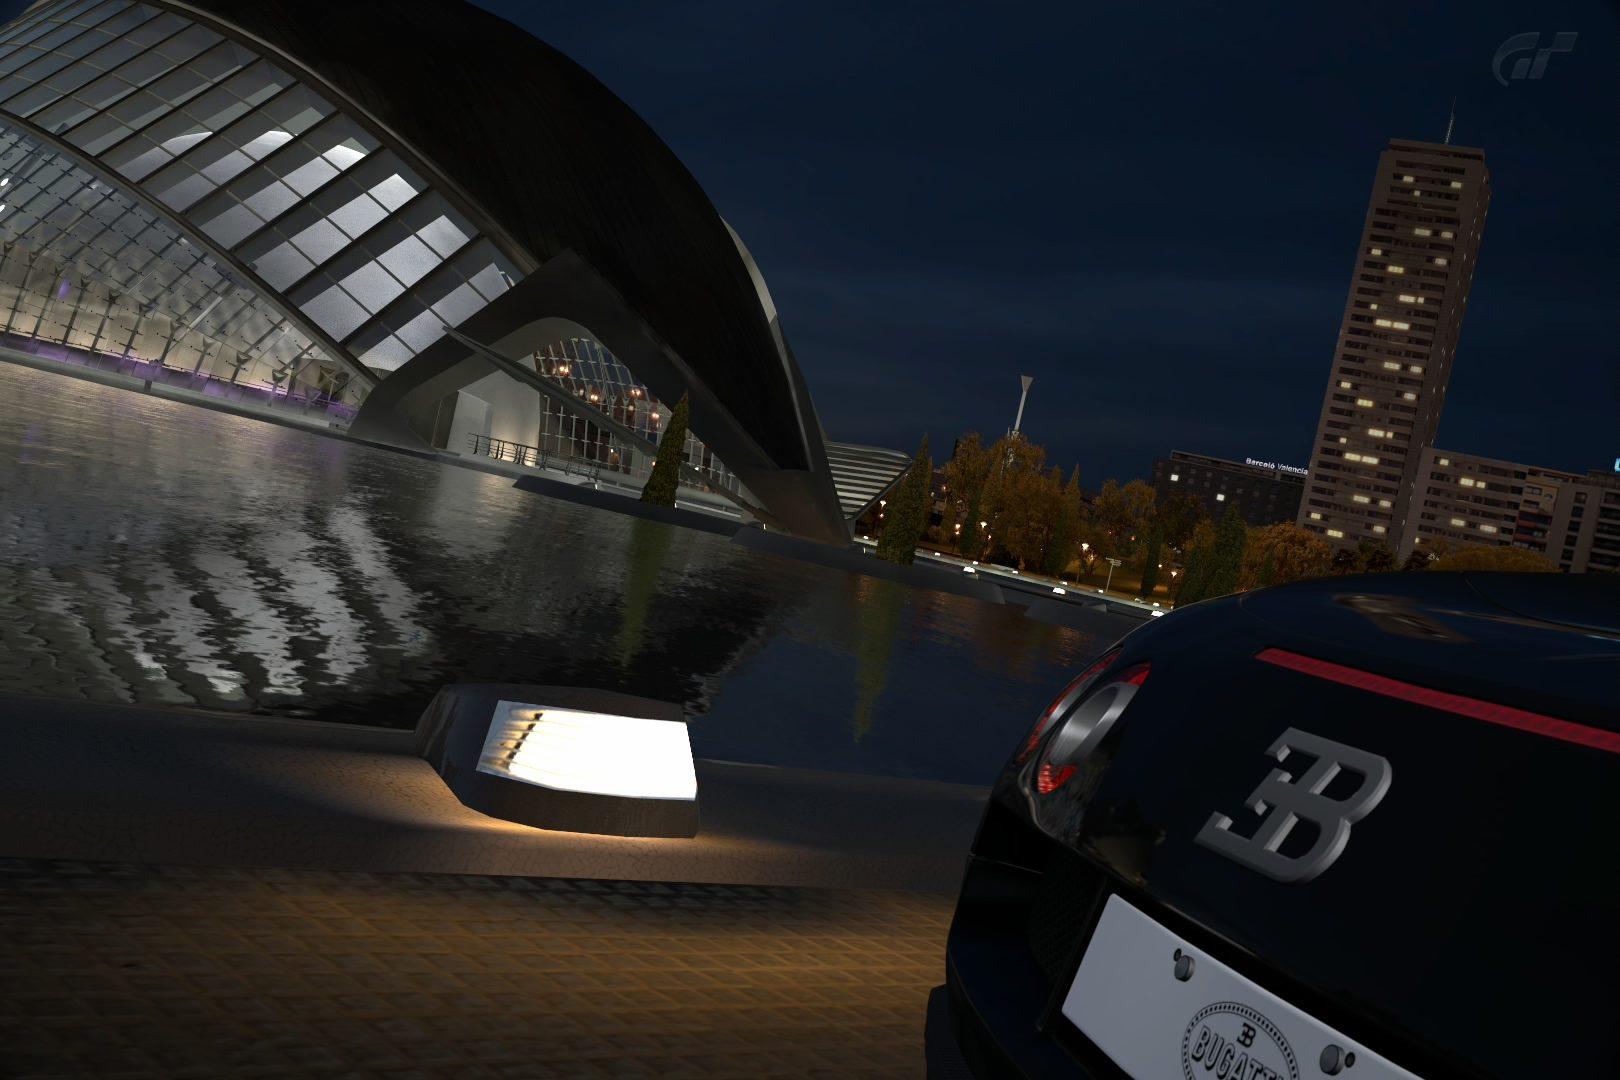 City of Arts and Sciences - Night_2.jpg